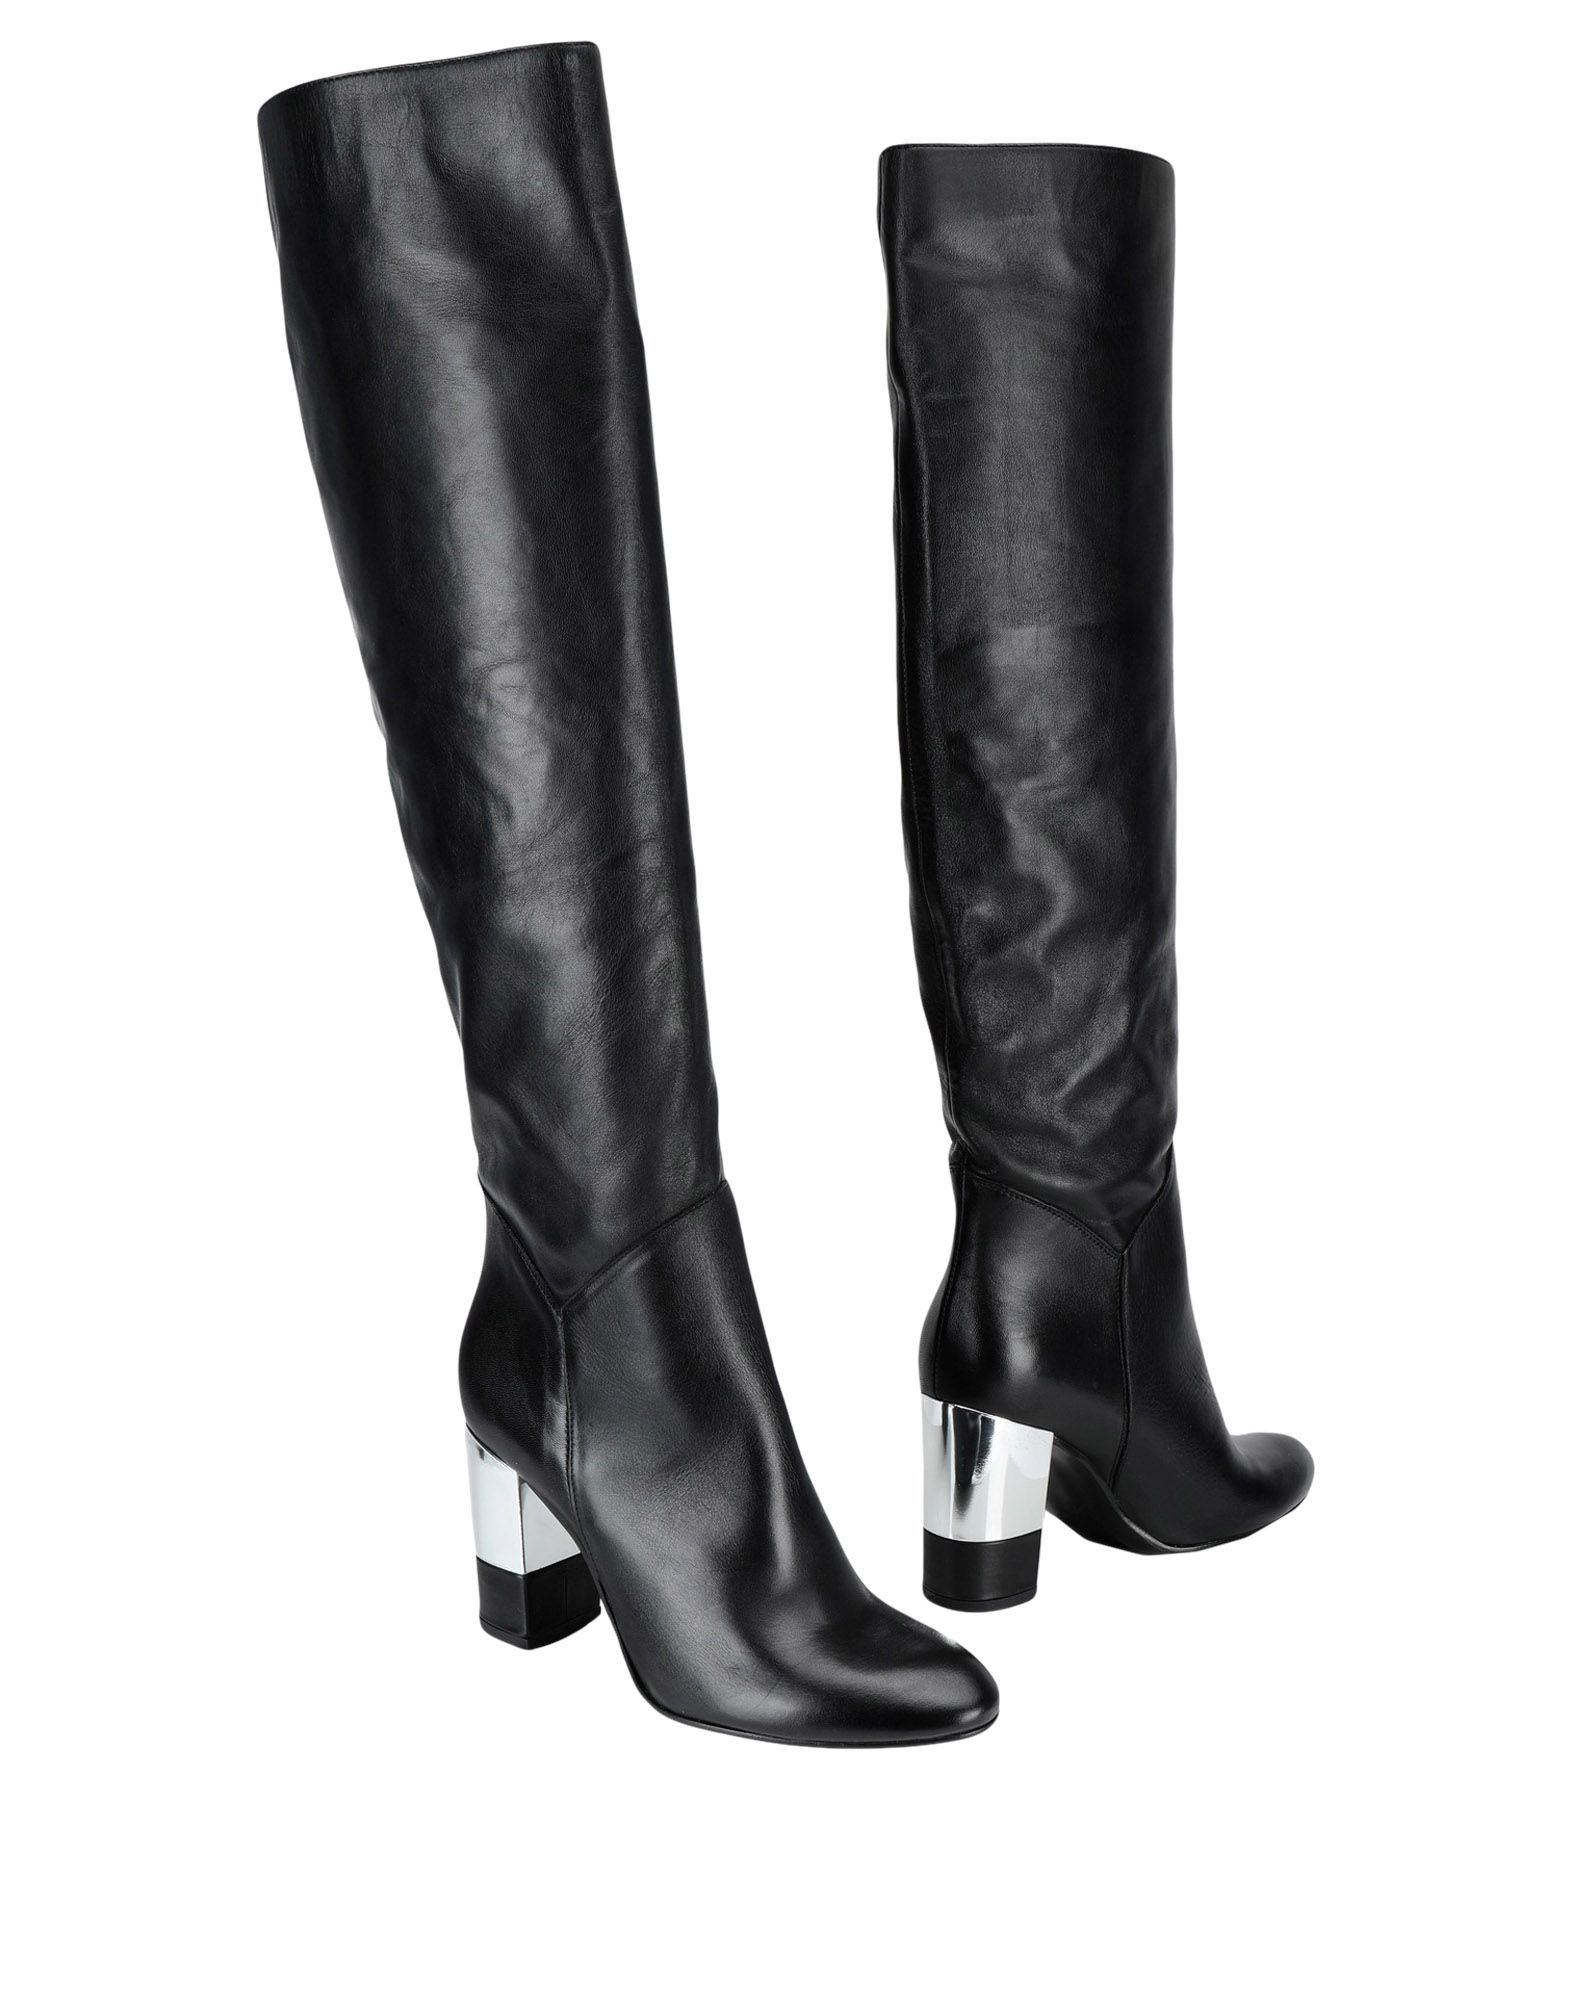 Moda Stivali Stivali Moda Accademia Donna - 11537657QW 55d0b8